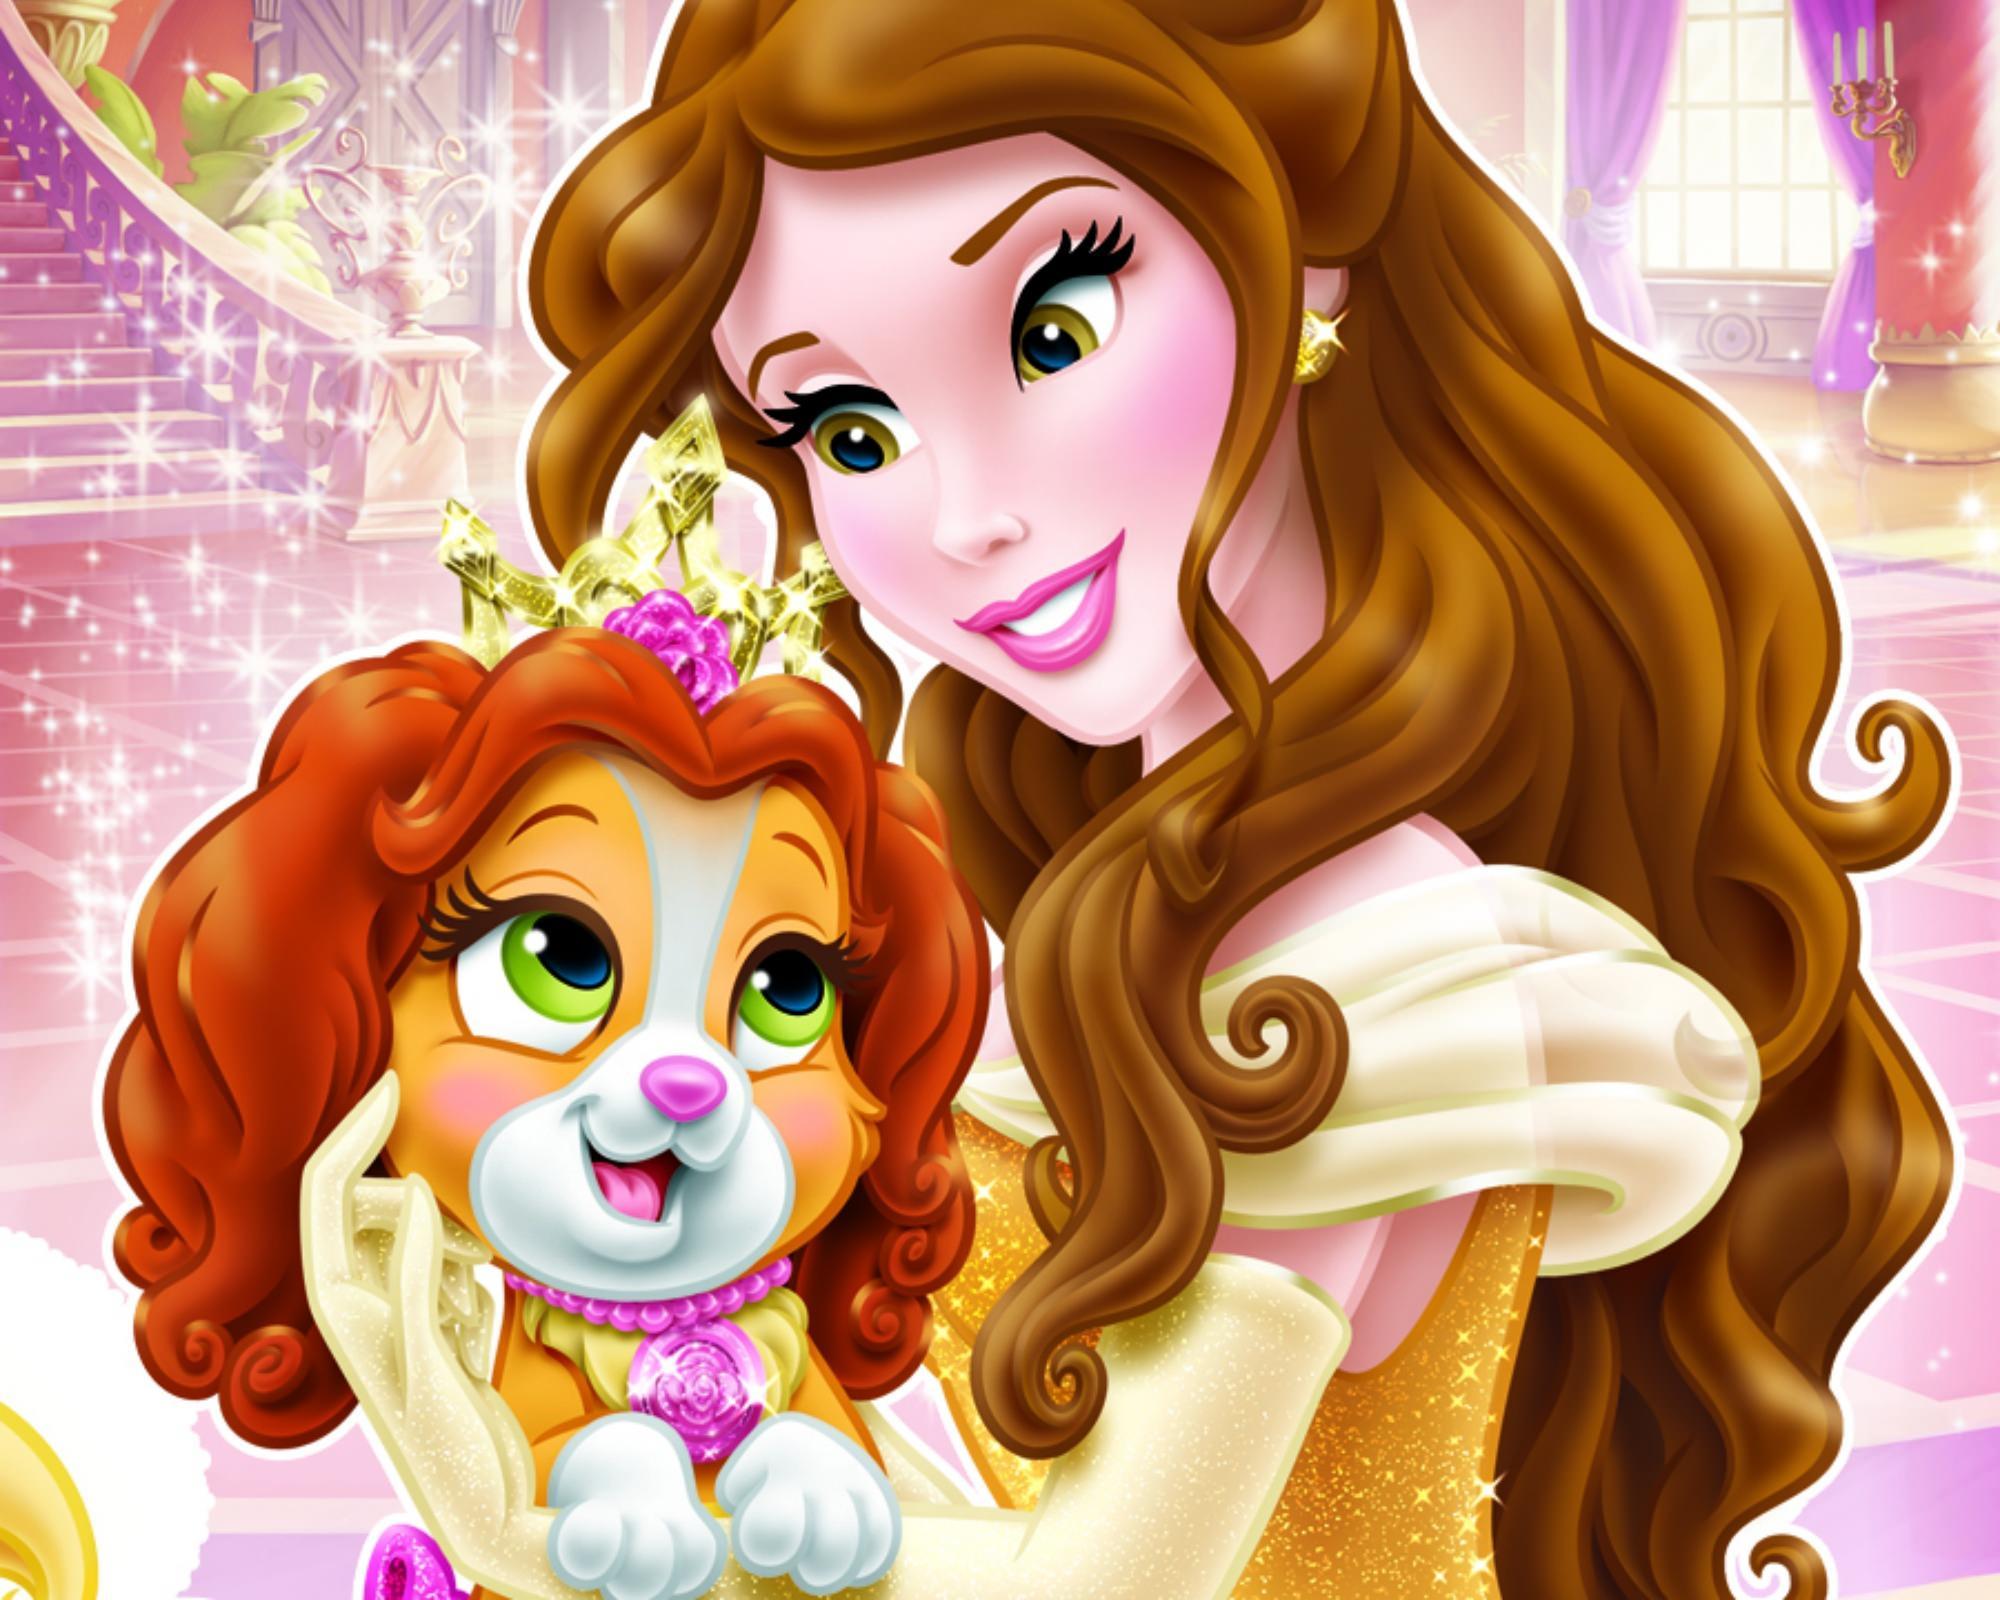 Teacup & Belle Disney Wallpaper